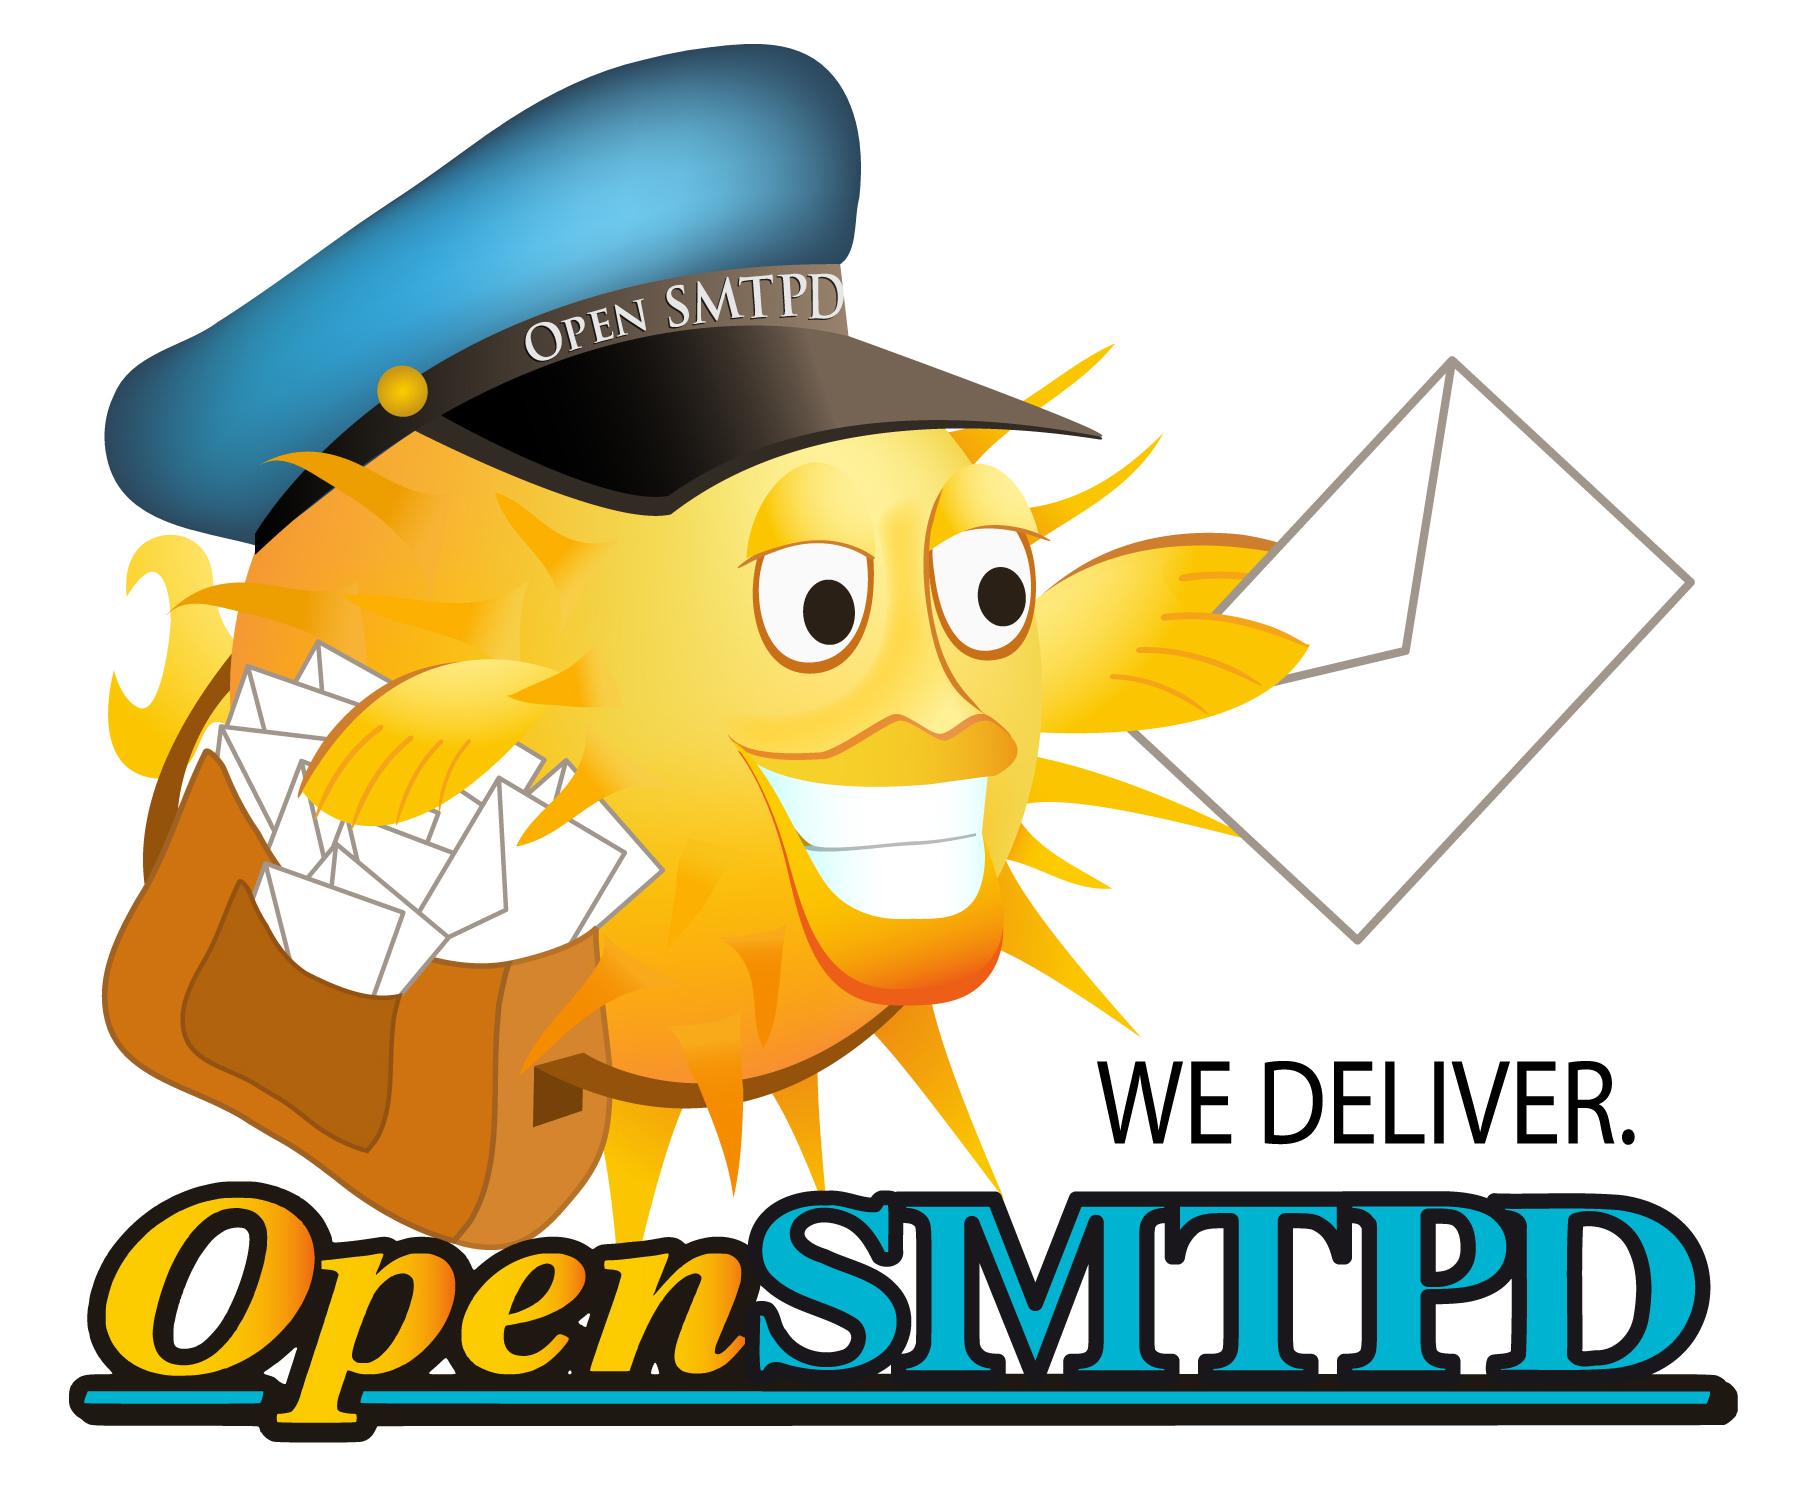 CVE-2020-7247: OpenSMTPD Library Remote Command Execution Vulnerability Alert